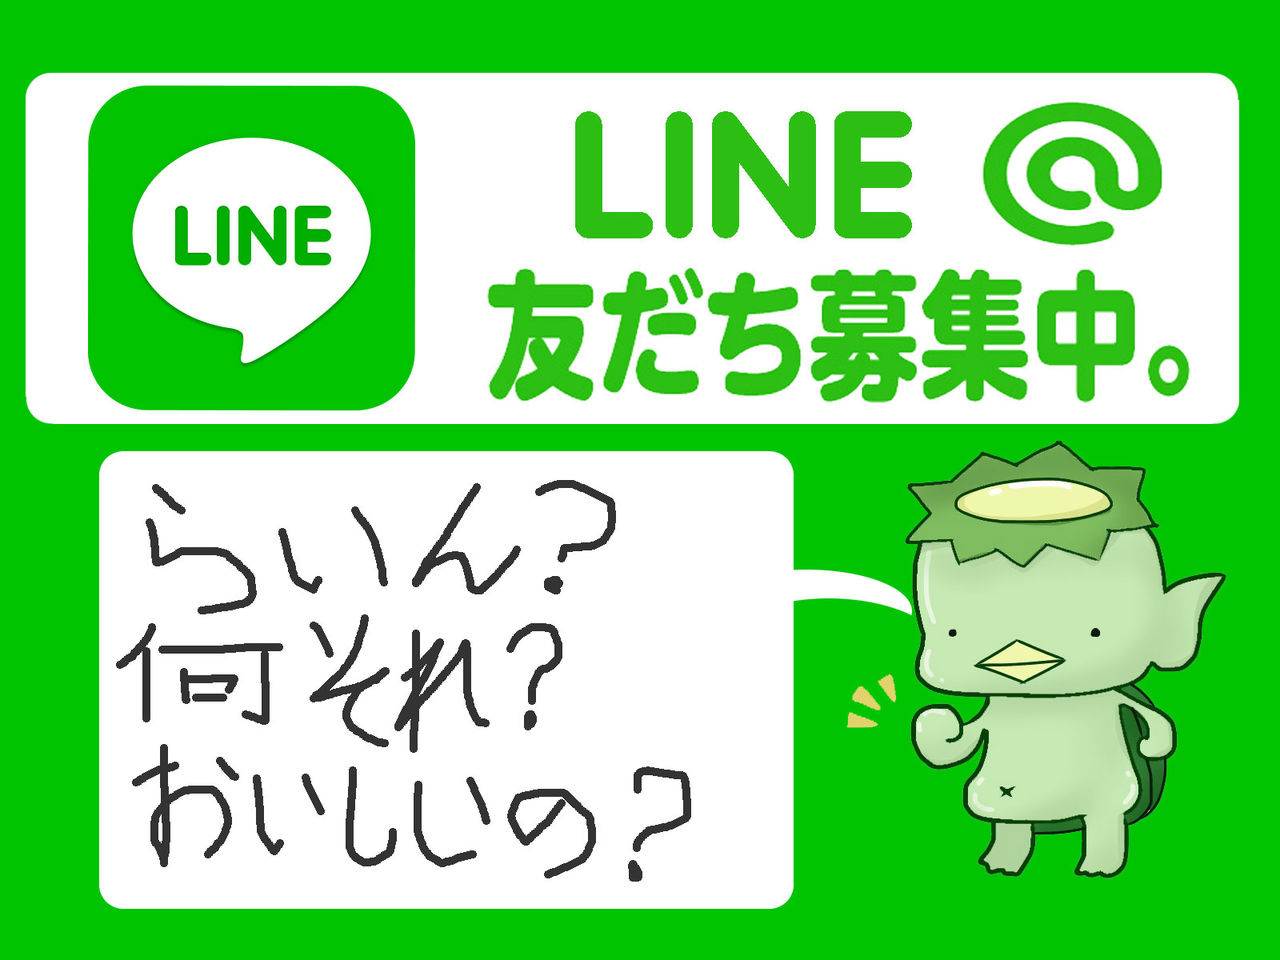 image(正規ロゴ使用var)